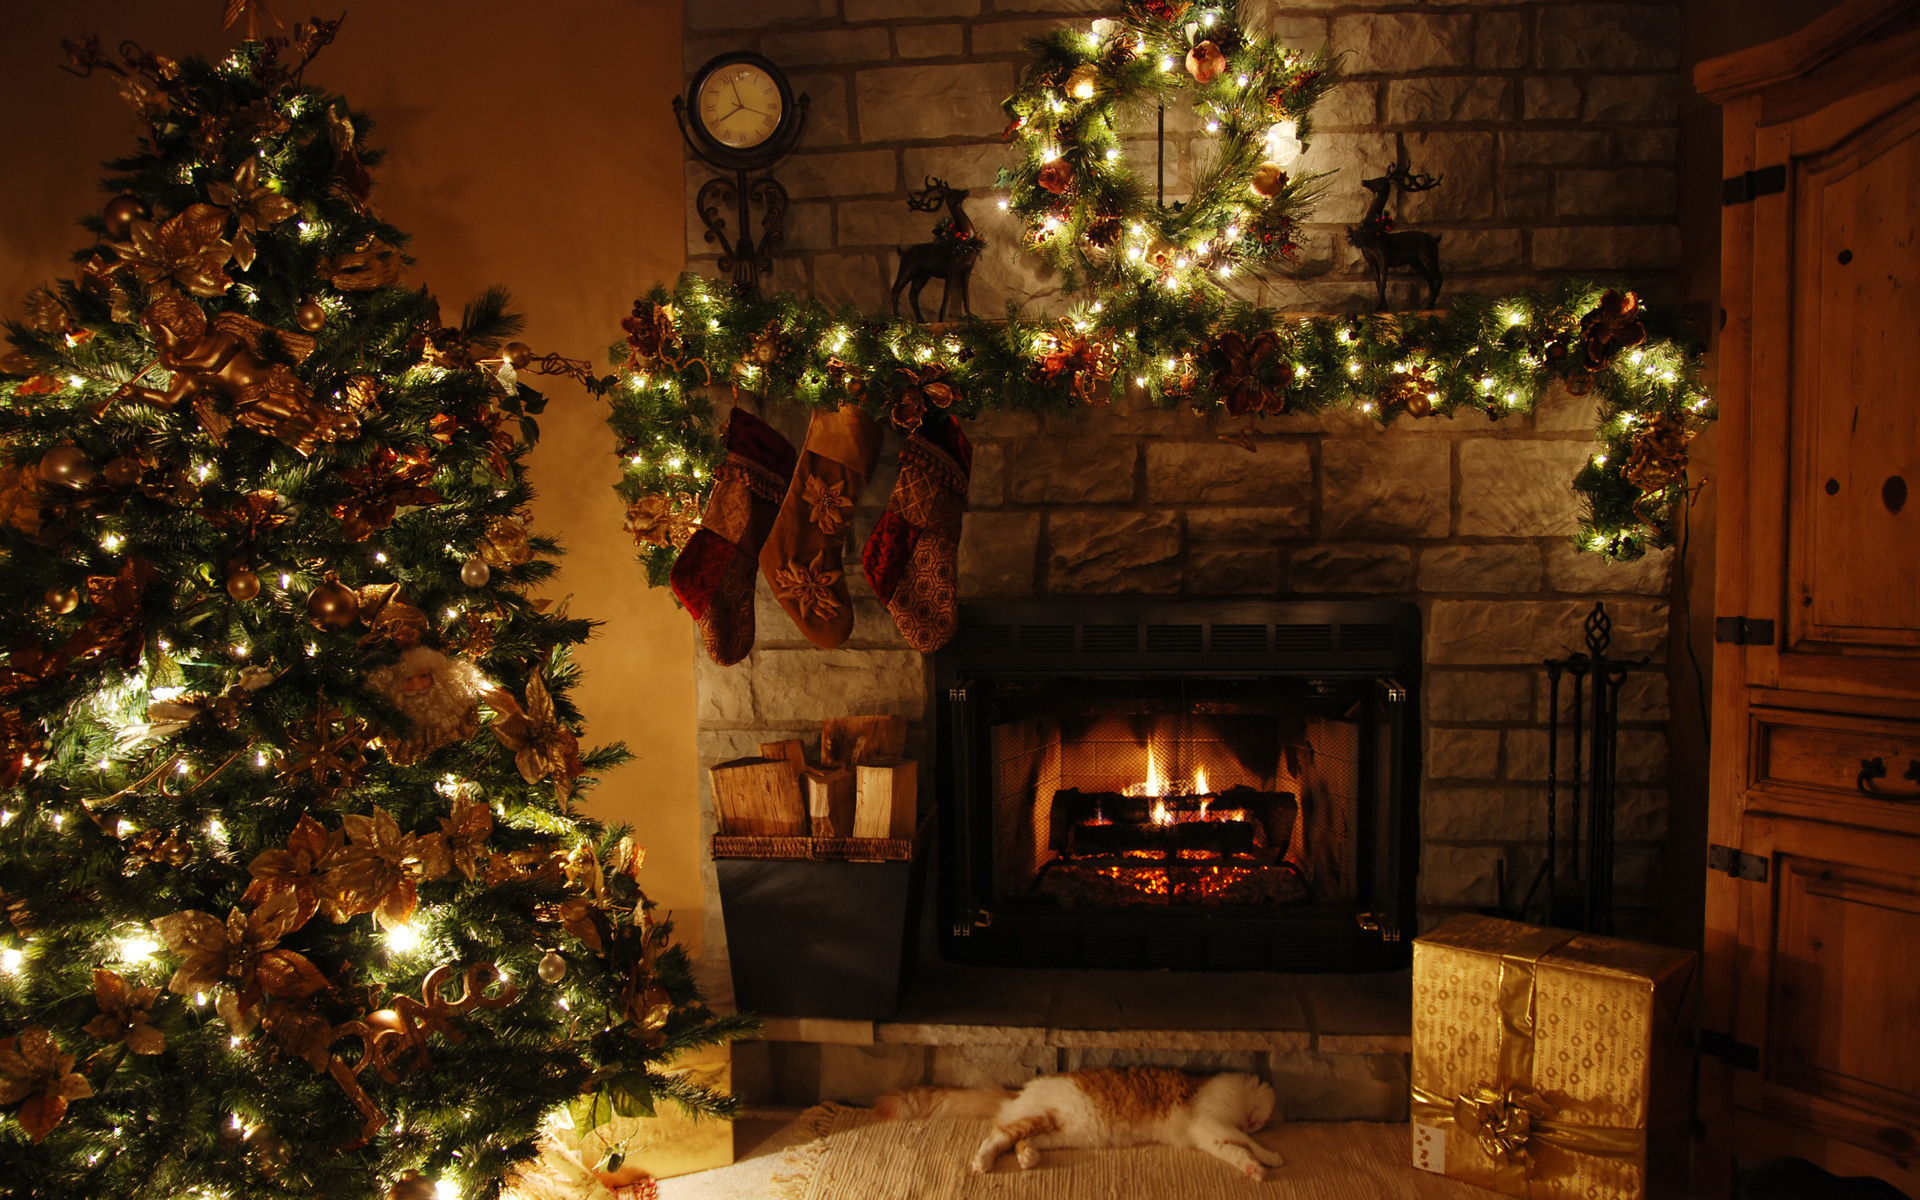 Time Traveler's guide to Christmas: Oh Christmas Tree ...